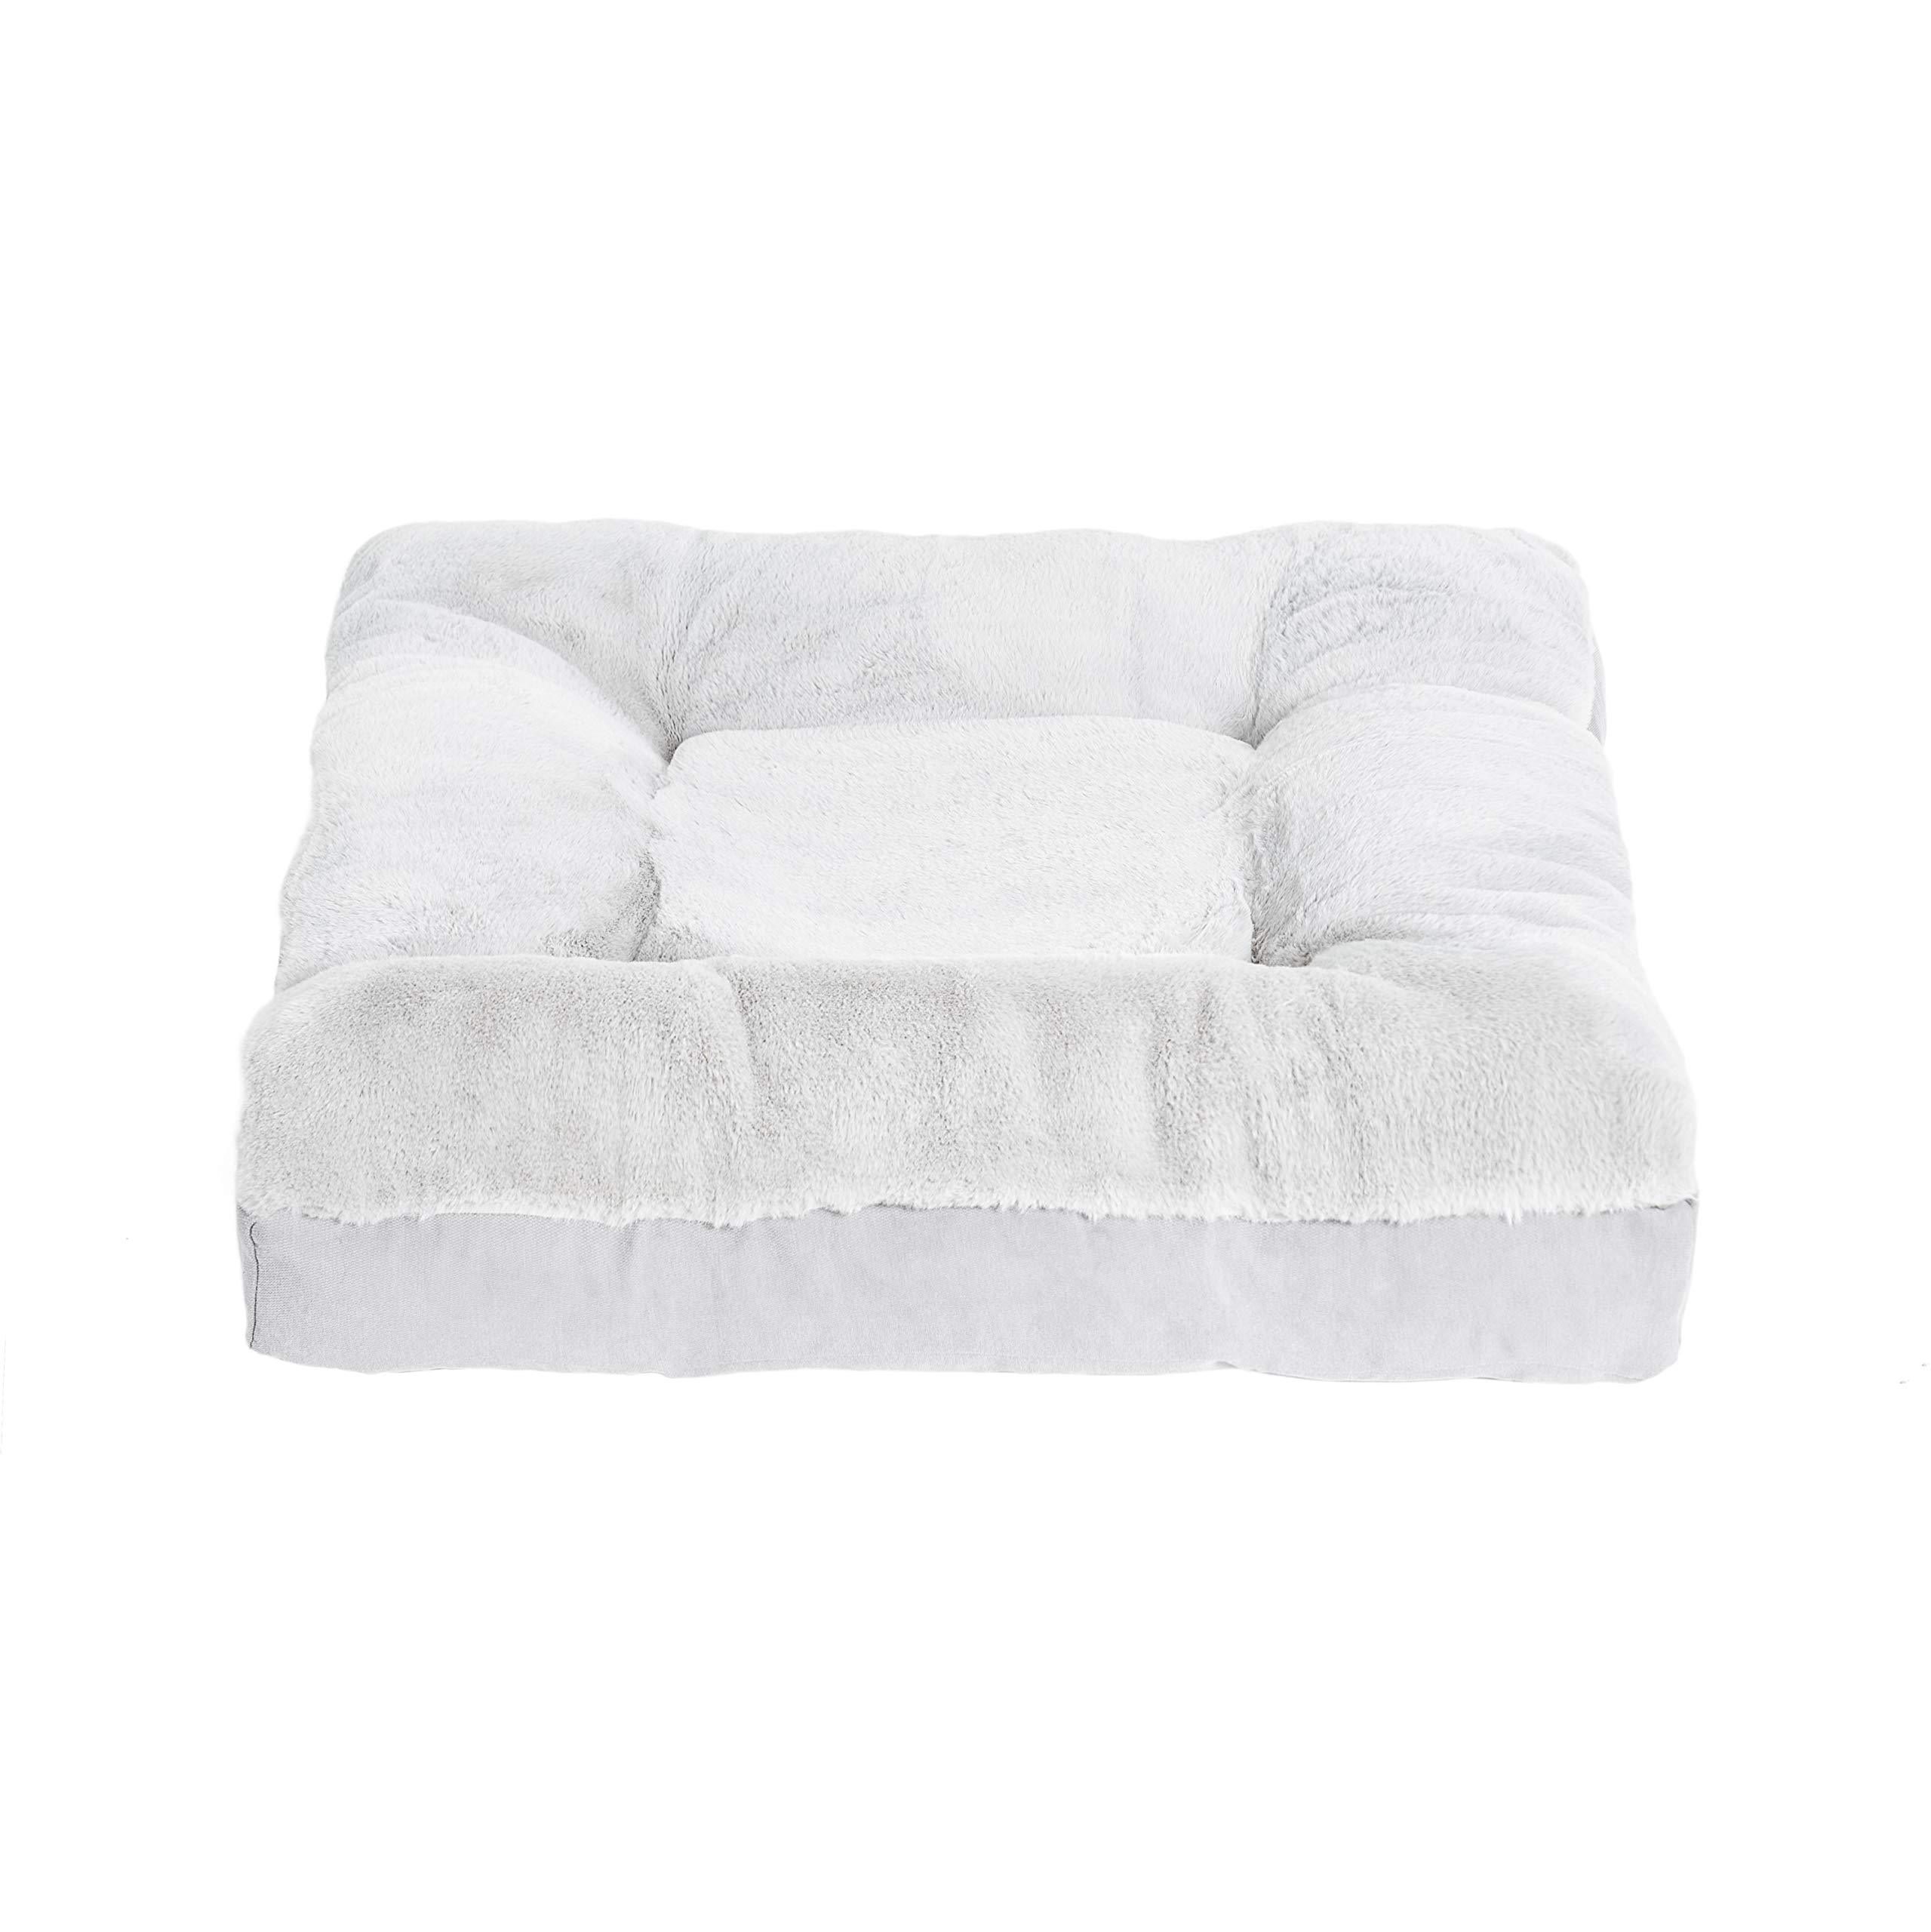 BarksBar Lazy Lounger - Large & Gray - Dual Layered Memory Foam & Orthopedic Foam Dog Bed Luxurious Faux Fur 38 x 38